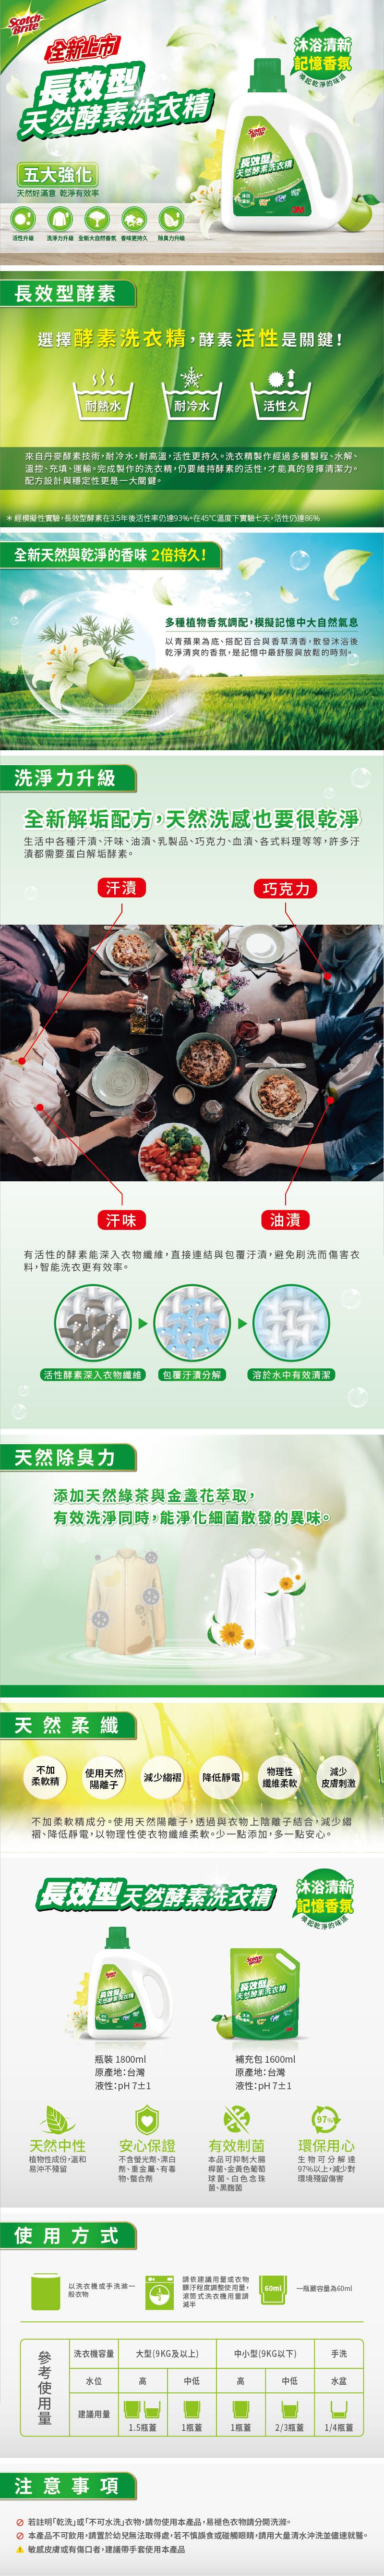 3M 長效型天然酵素洗衣精-content-沐浴清新香氛-7_全.jpg